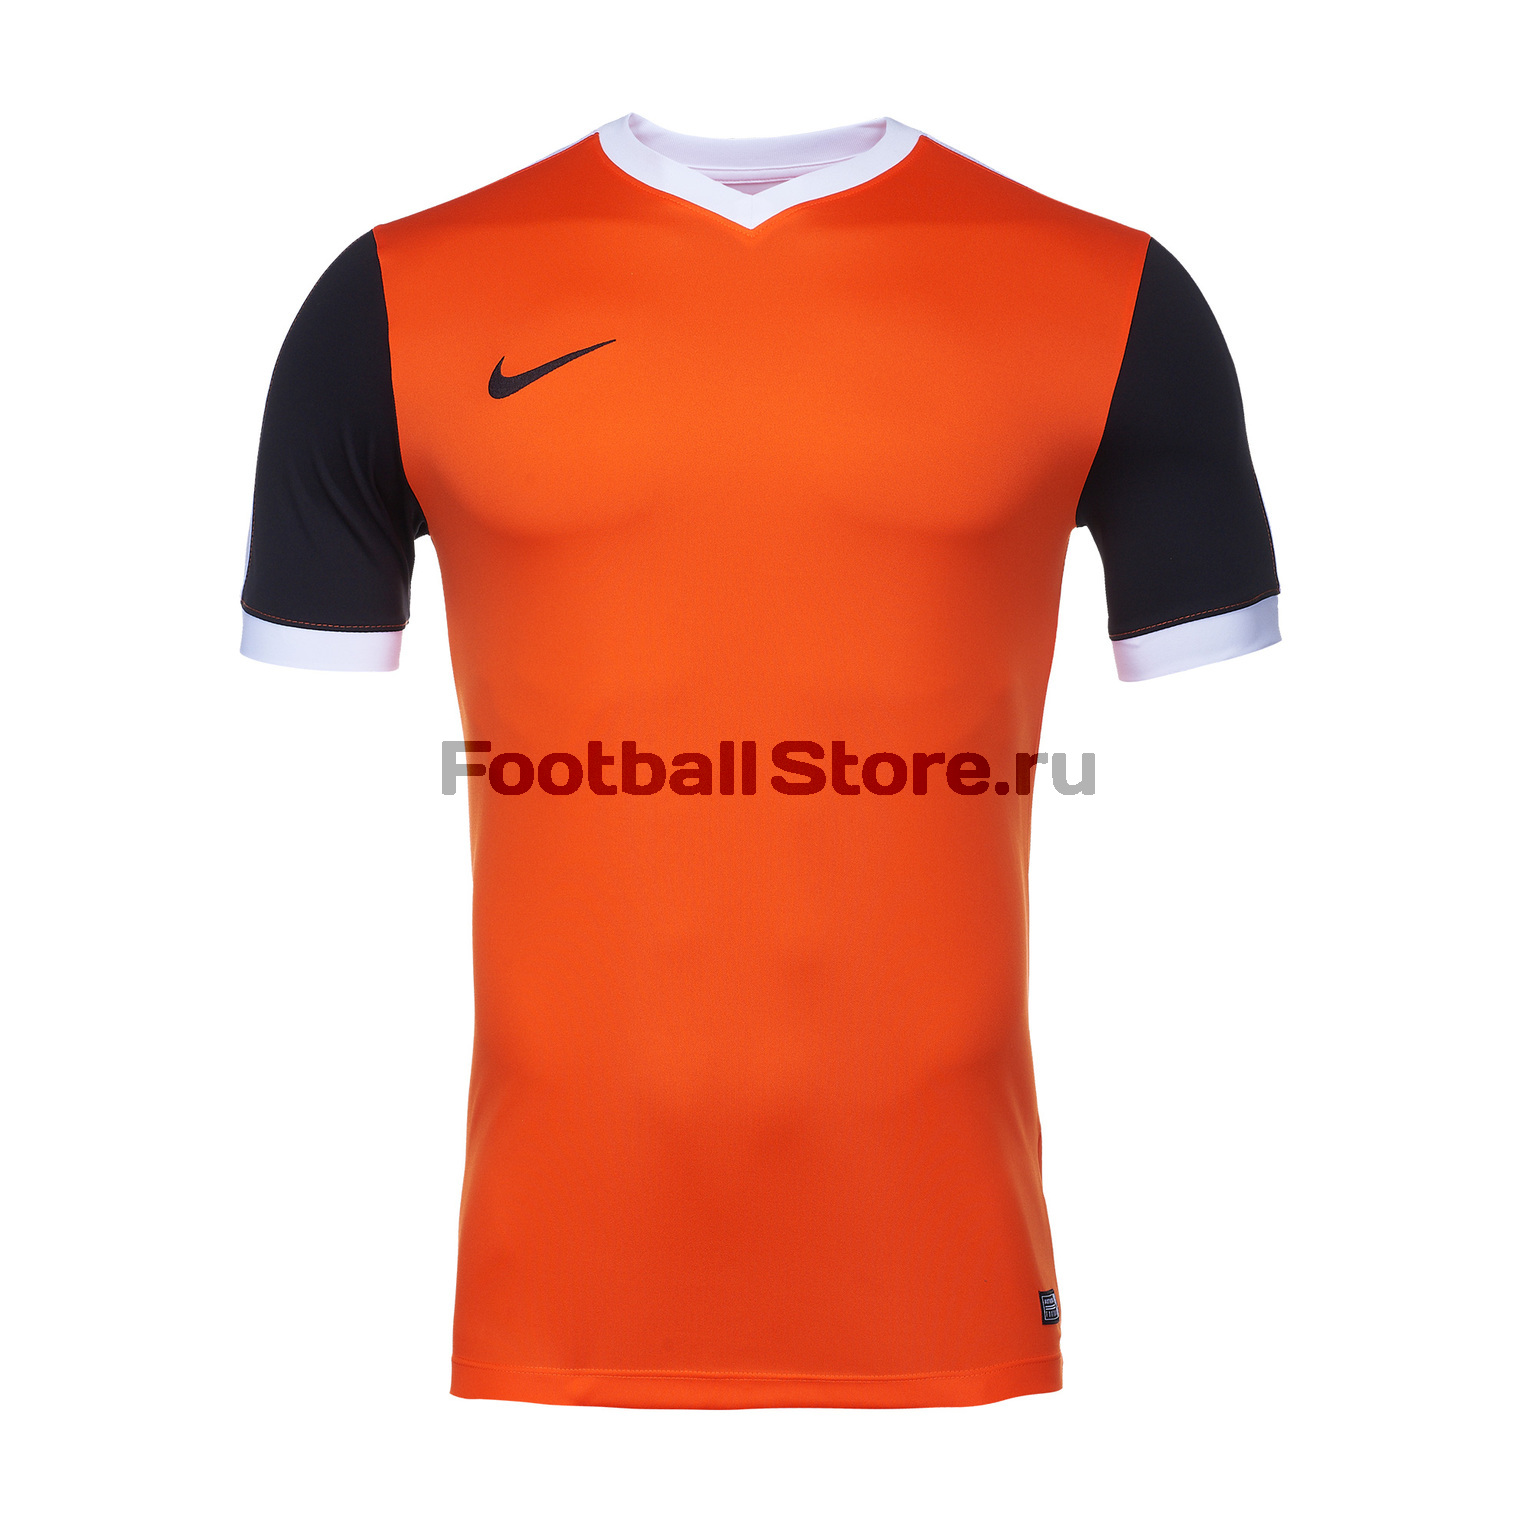 Футболки Nike Футболка Nike SS Striker IV JSY 725892-815 футболки nike футболка nike ss striker iv jsy 725892 657